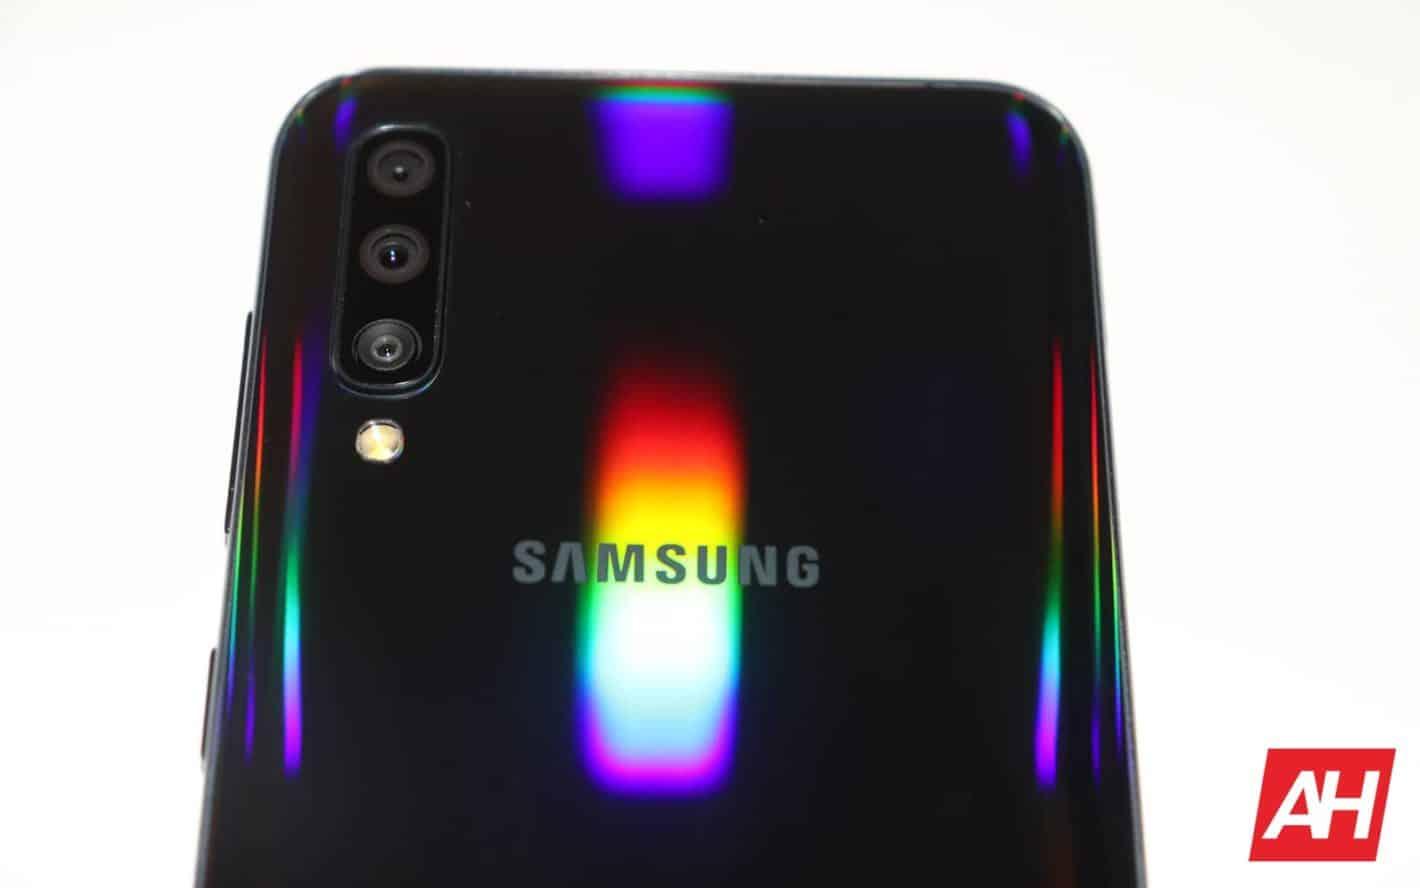 Samsung Galaxy A50 logo DG 05 AH 2019